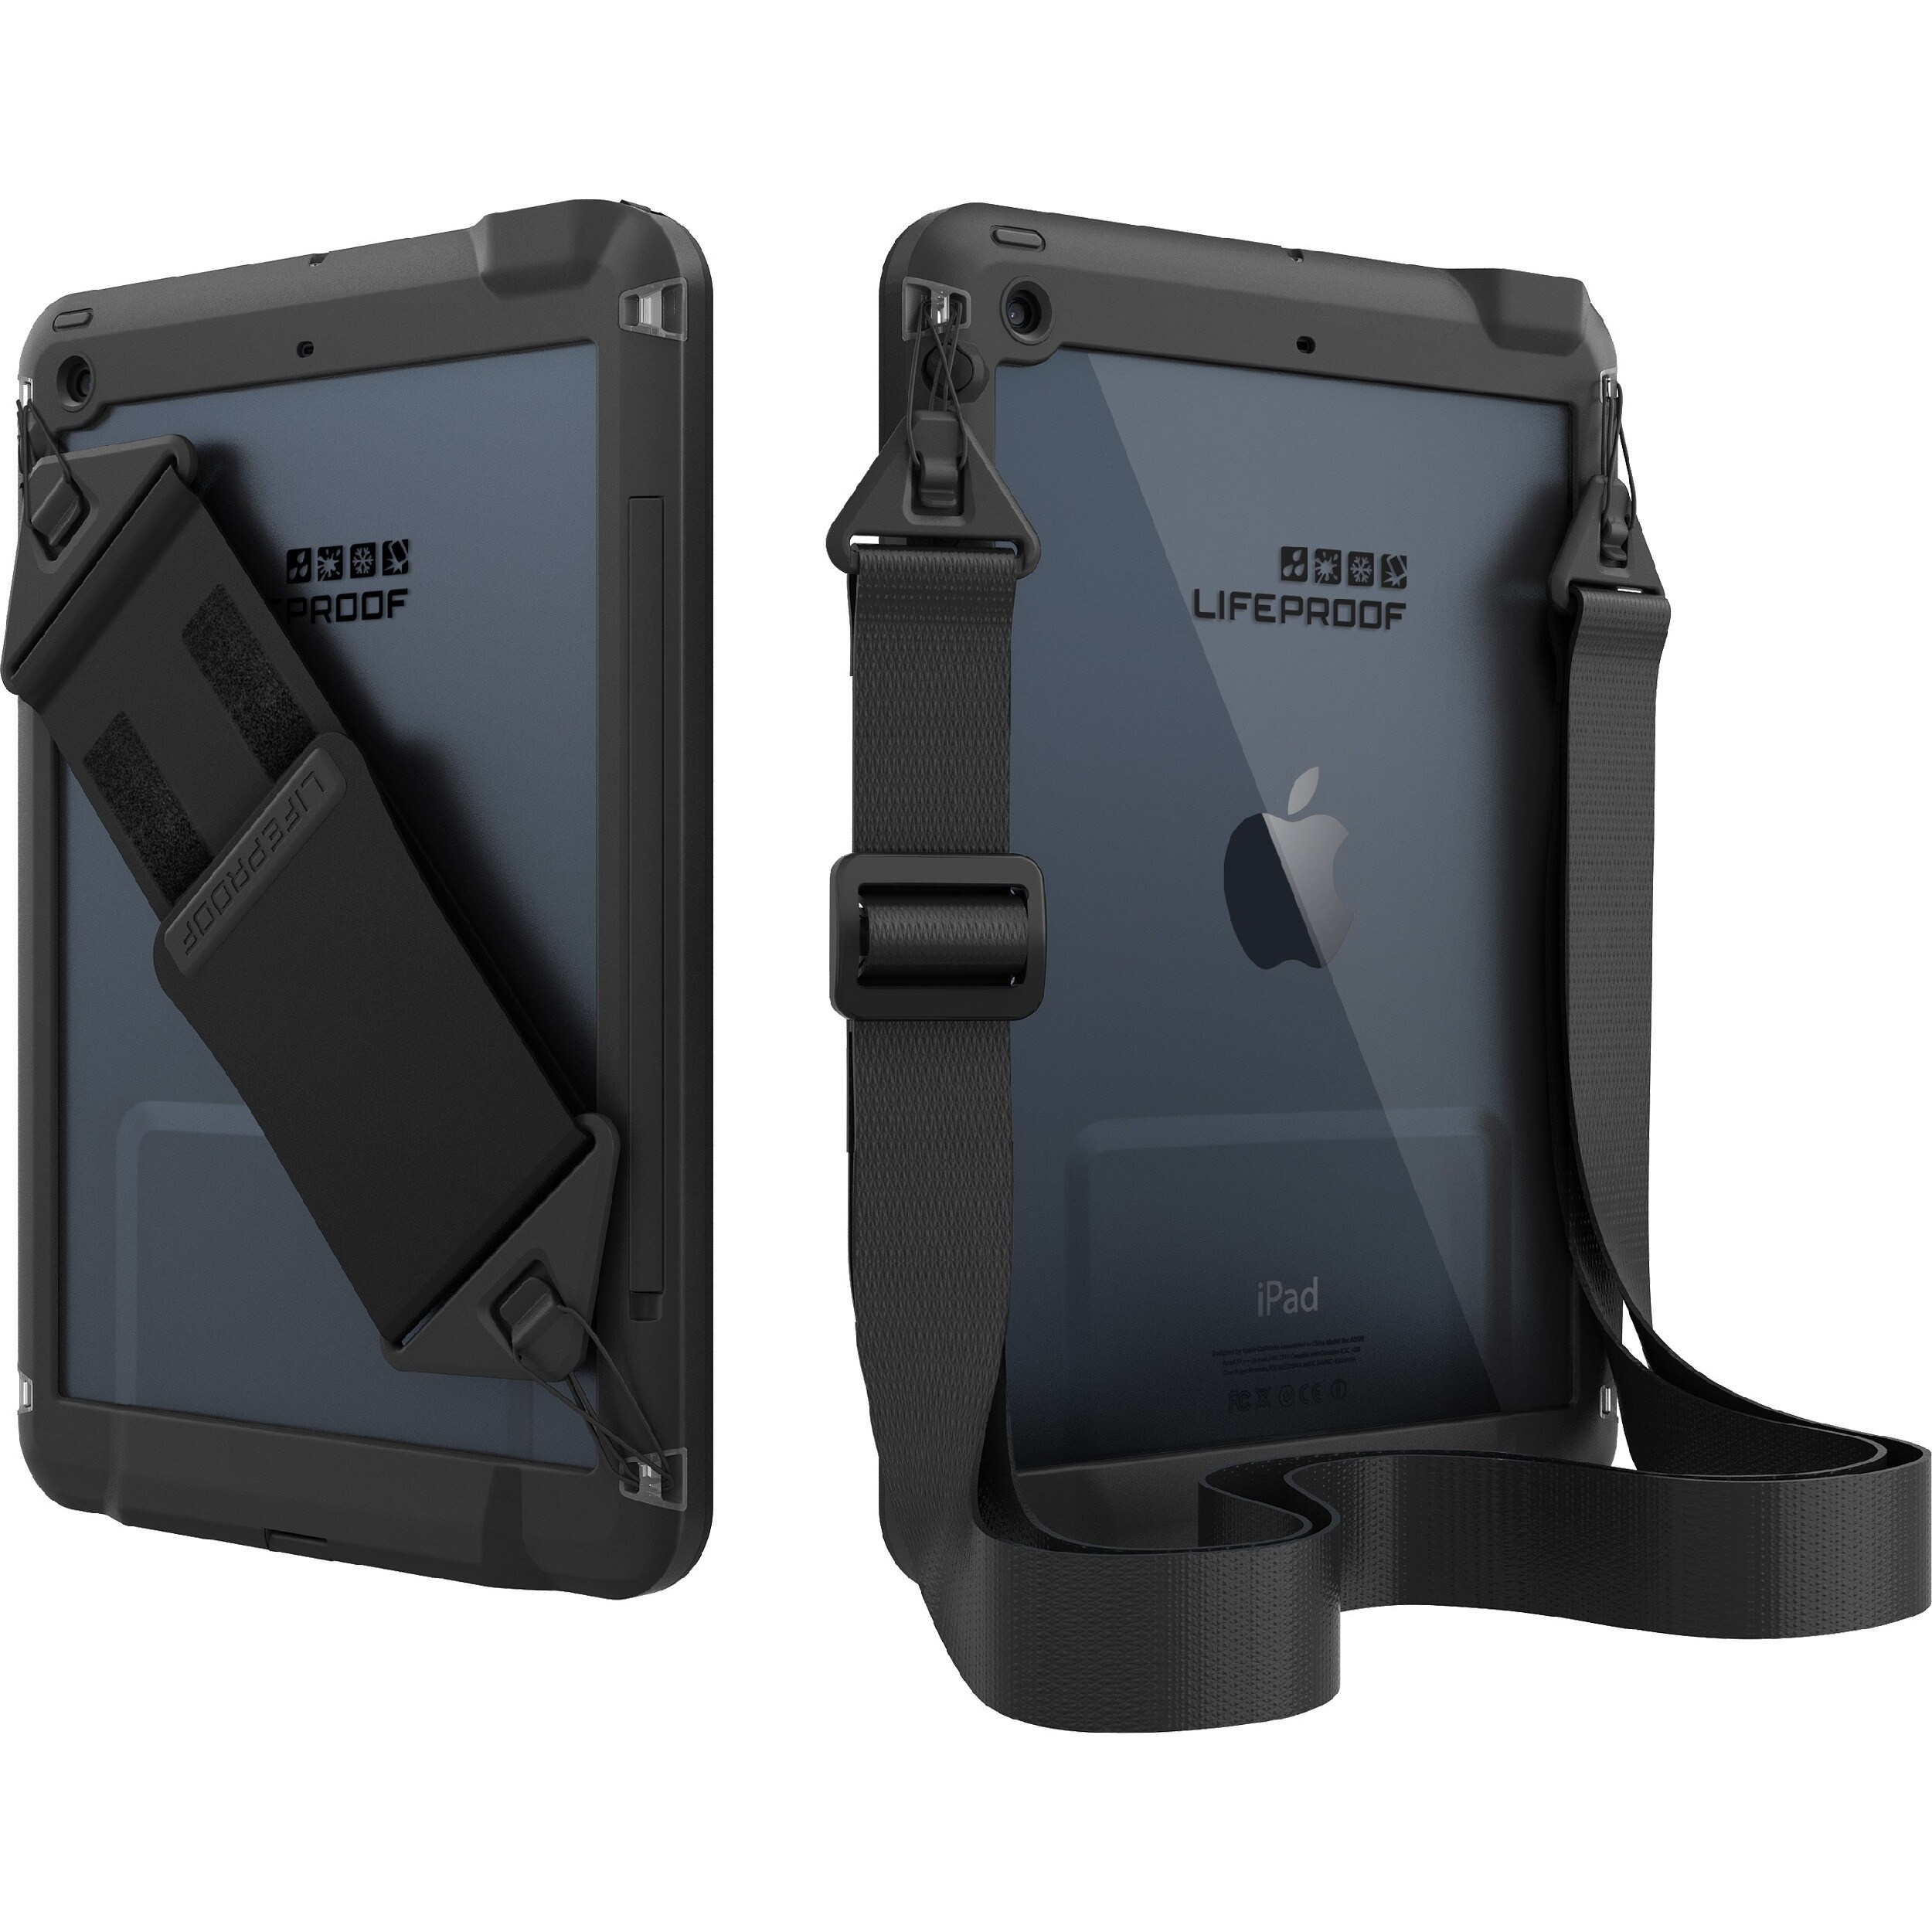 sale retailer b5b2c d15f1 OtterBox iPad Air Case Hand and Shoulder Strap - frē and nüüd